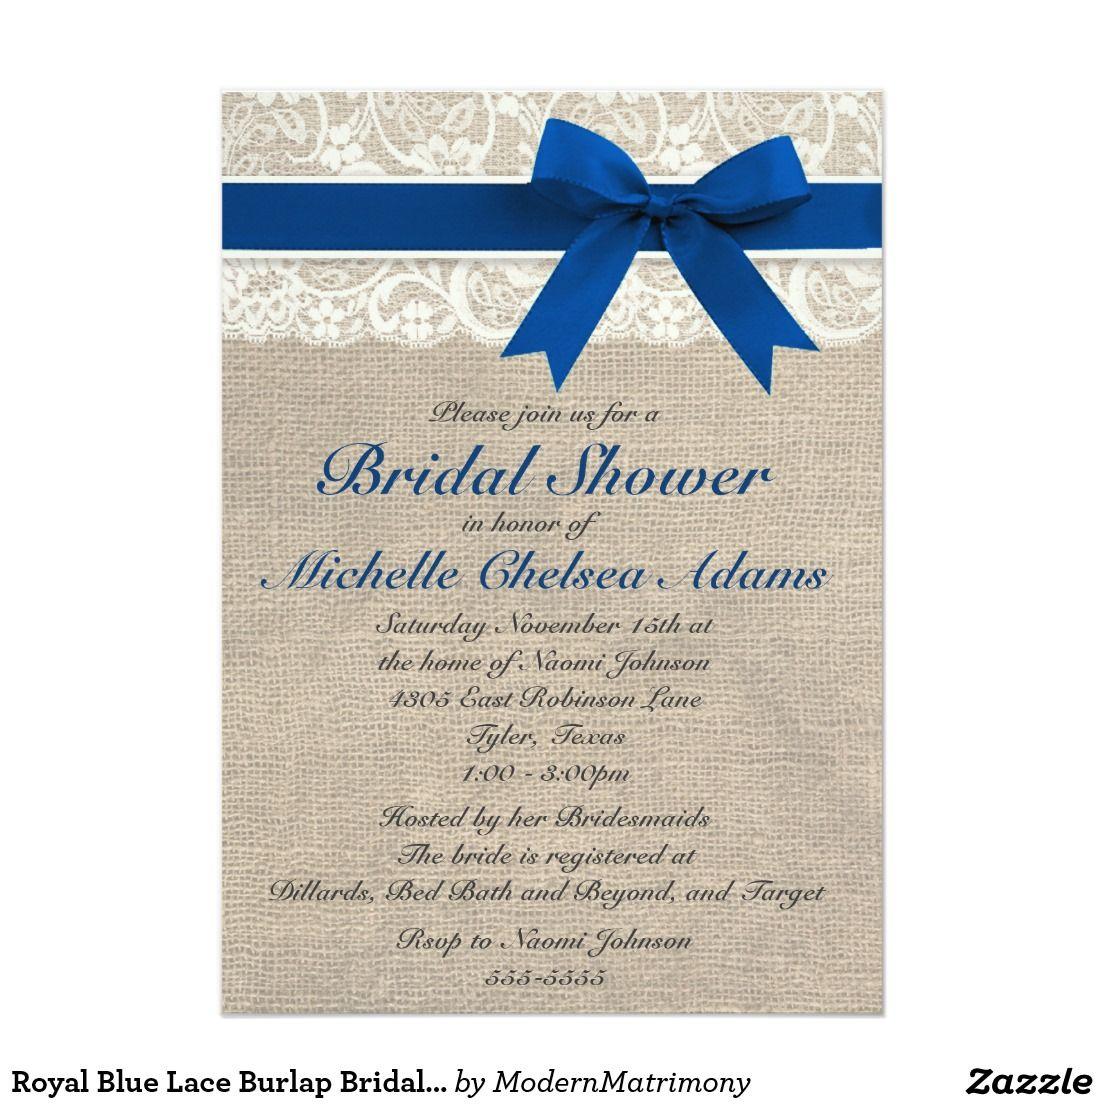 Royal Blue Lace Burlap Bridal Shower Invitation | Wedding Ideas ...